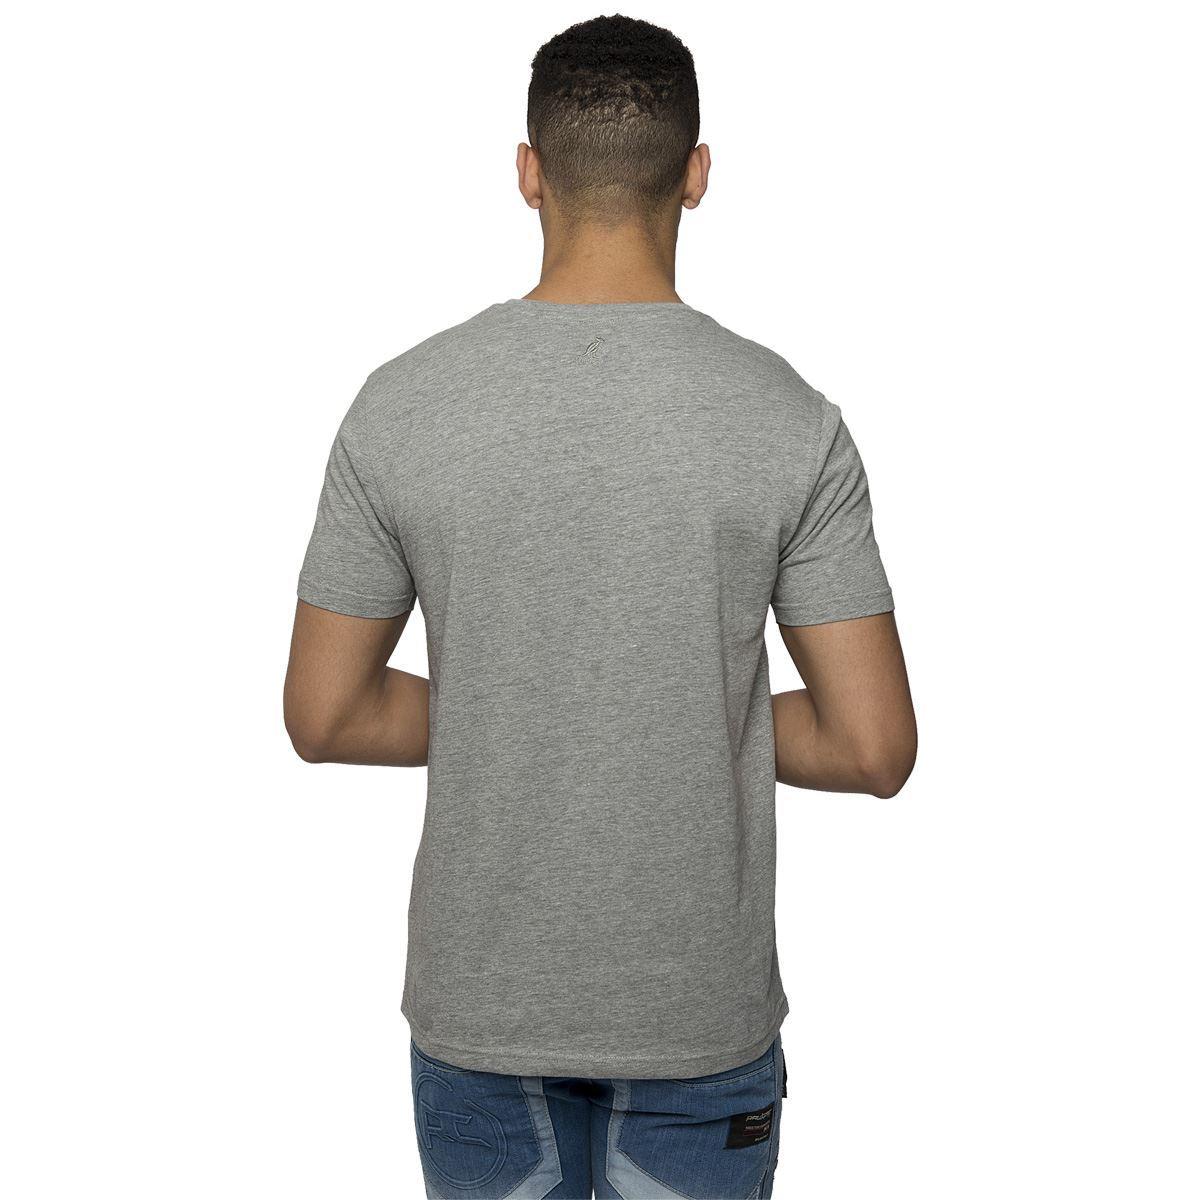 Kangol Mens Casual Plain T Shirt Branded Print Tee Short